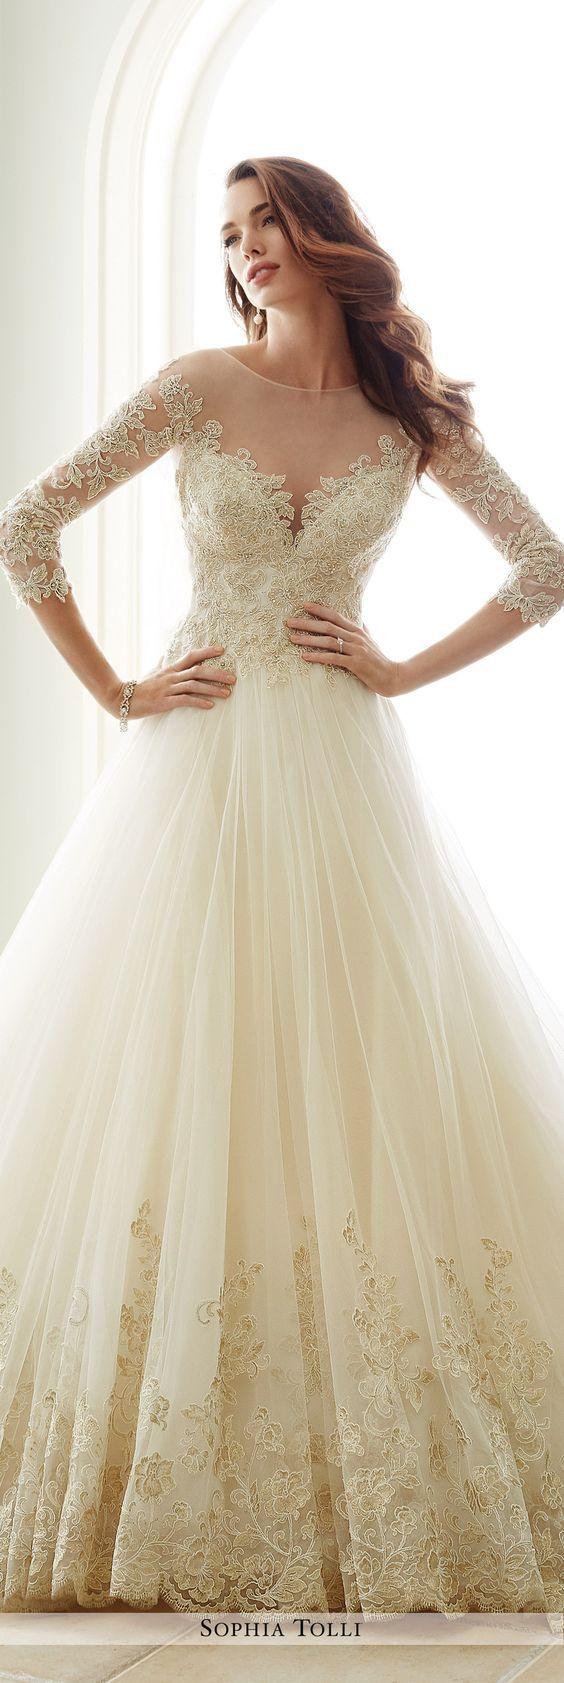 Y andria sophia tolli wedding dress the big day